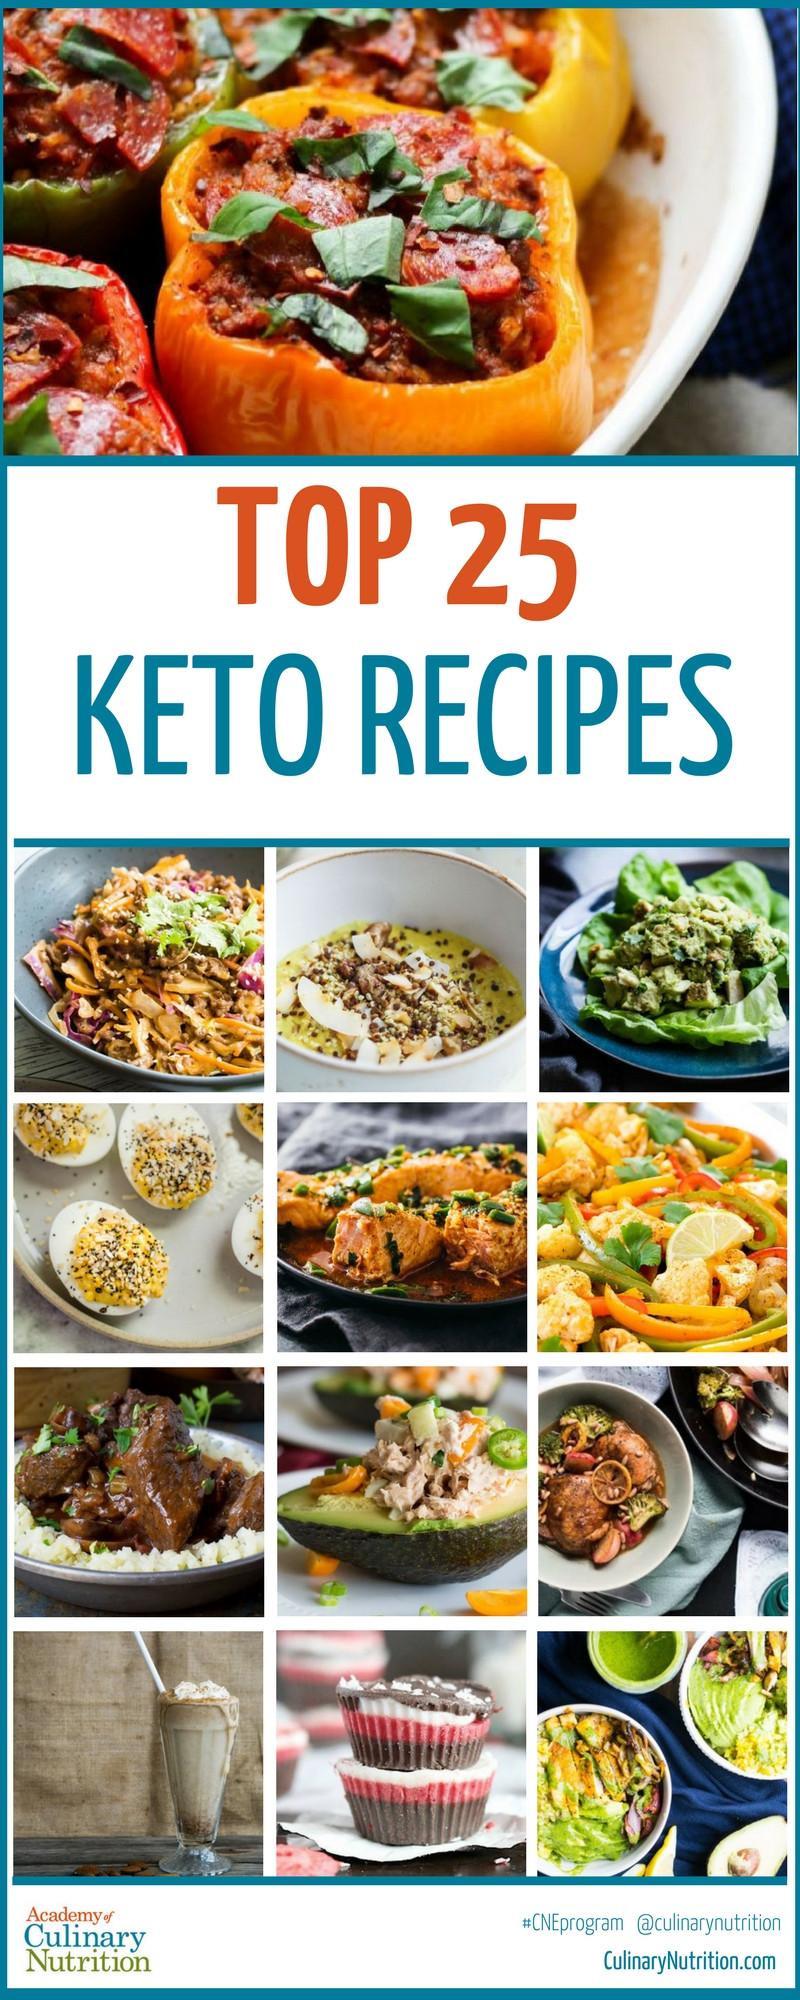 Keto Dairy Free Recipes  Top 25 Keto Recipes